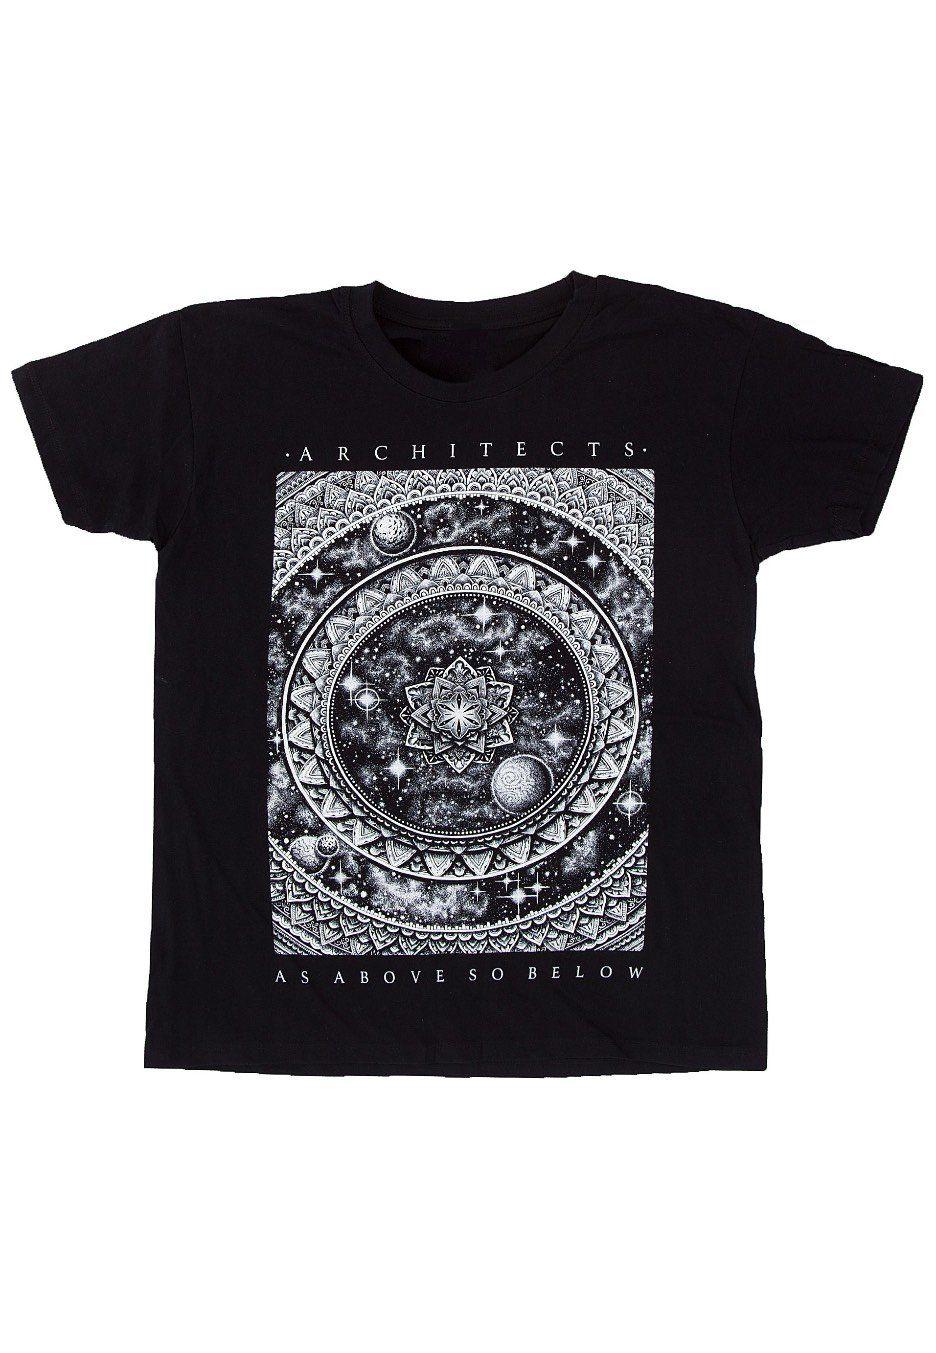 New Official ARCHITECTS MANDALA T-Shirt